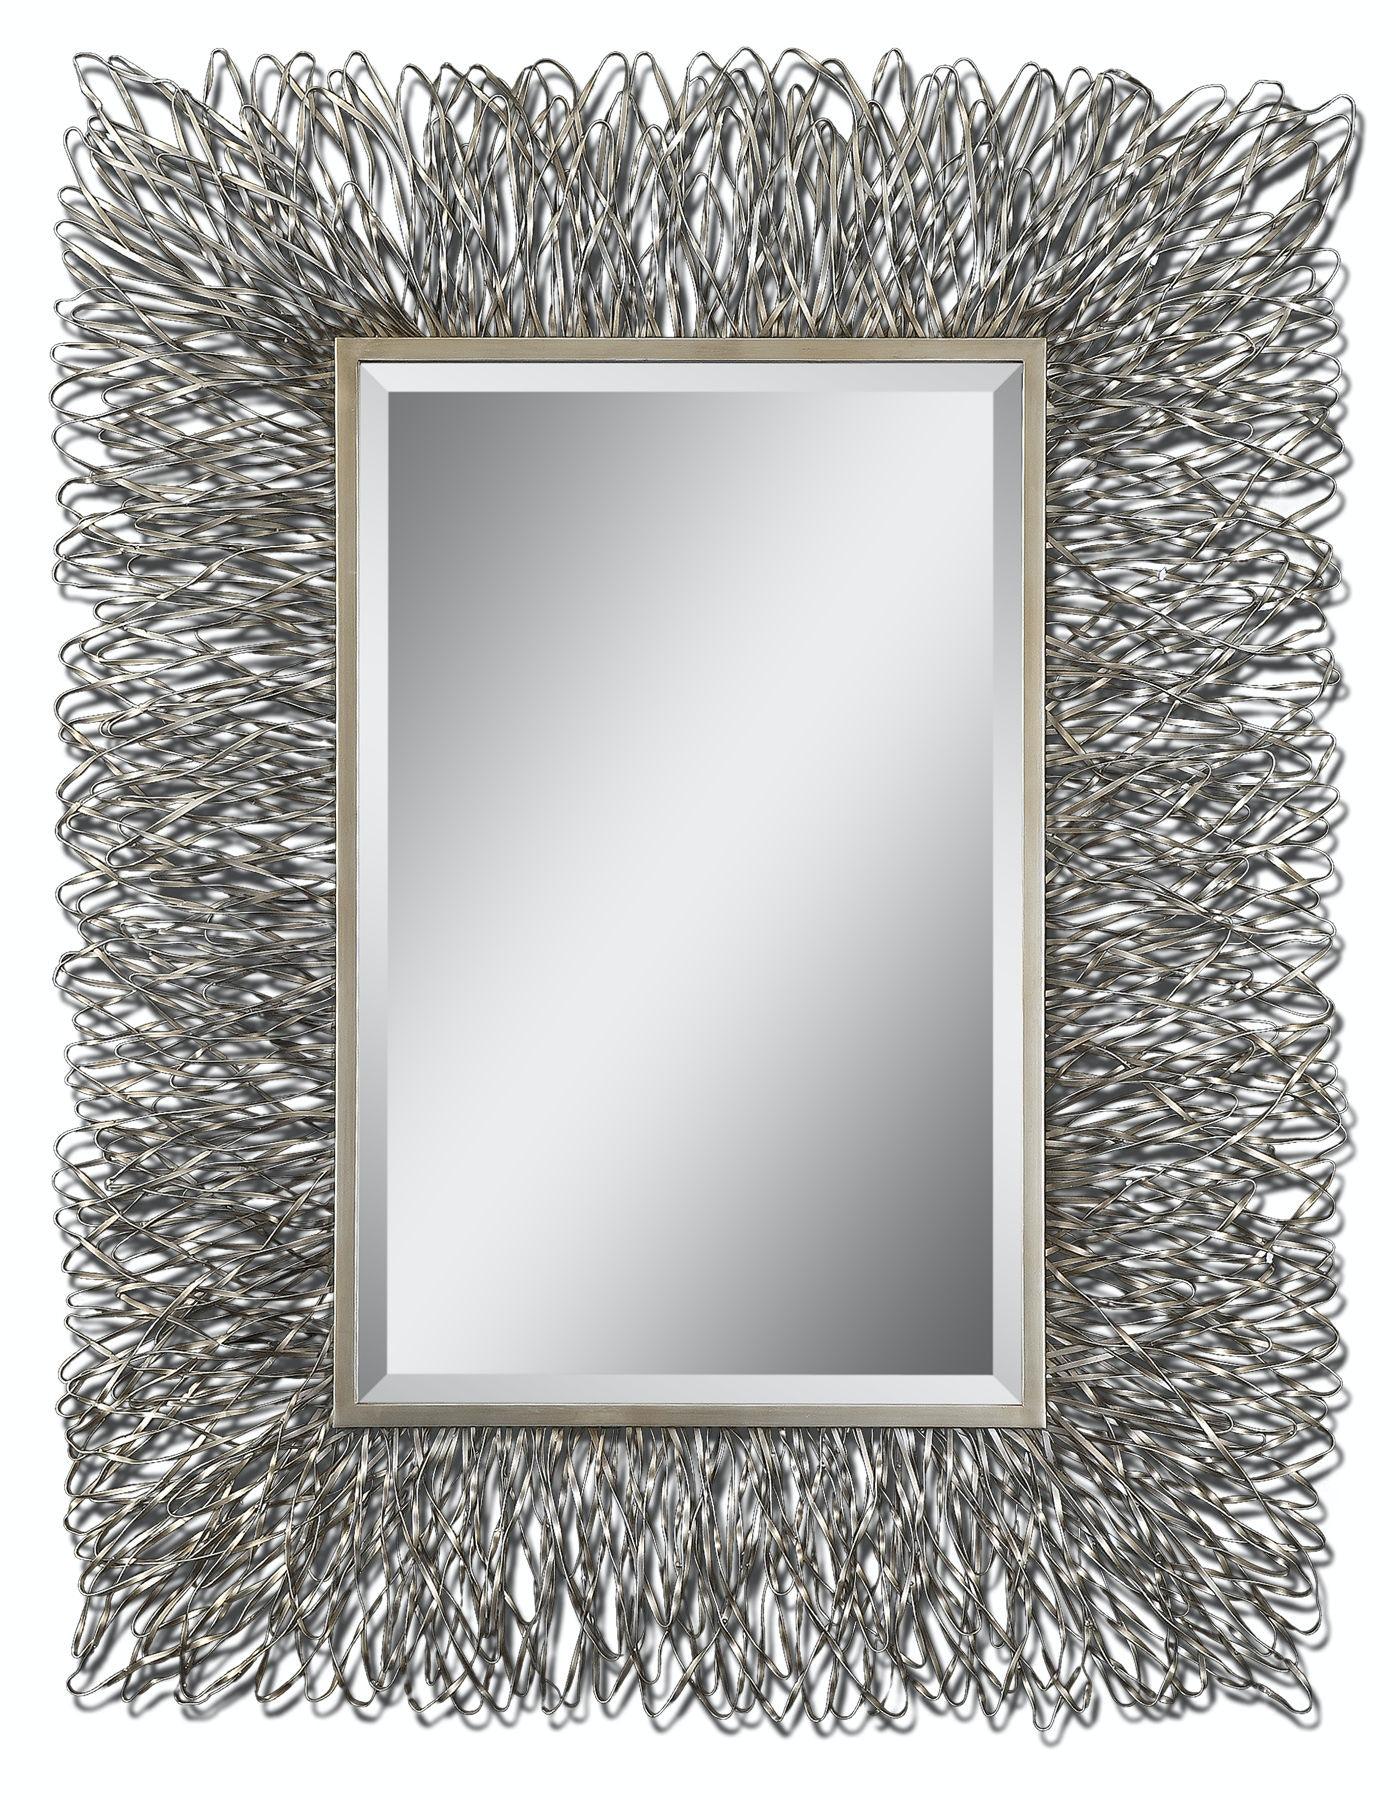 uttermost corbis decorative metal mirror ut07627 from walter e  smithe furniture   design corbis decorative metal mirror ut07627  rh   smithe